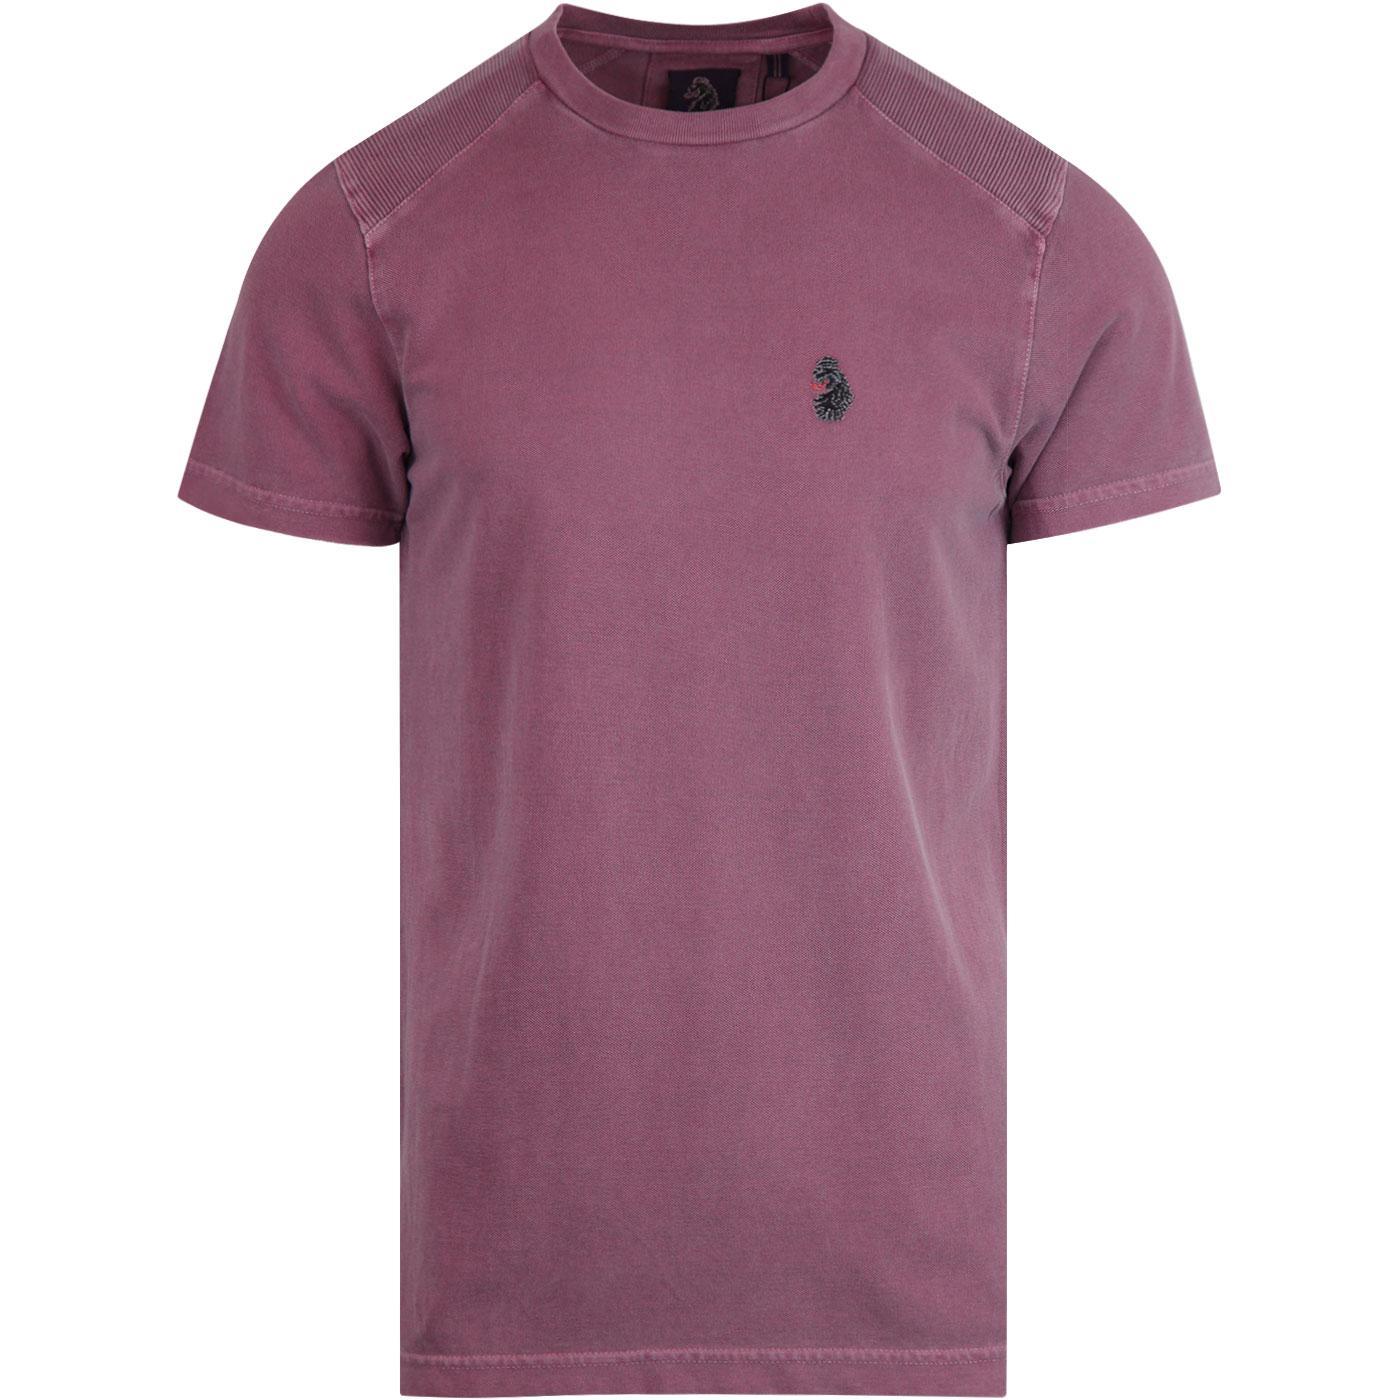 Mako LUKE 1977 Retro Dyed Crew Neck T-Shirt GRAPE